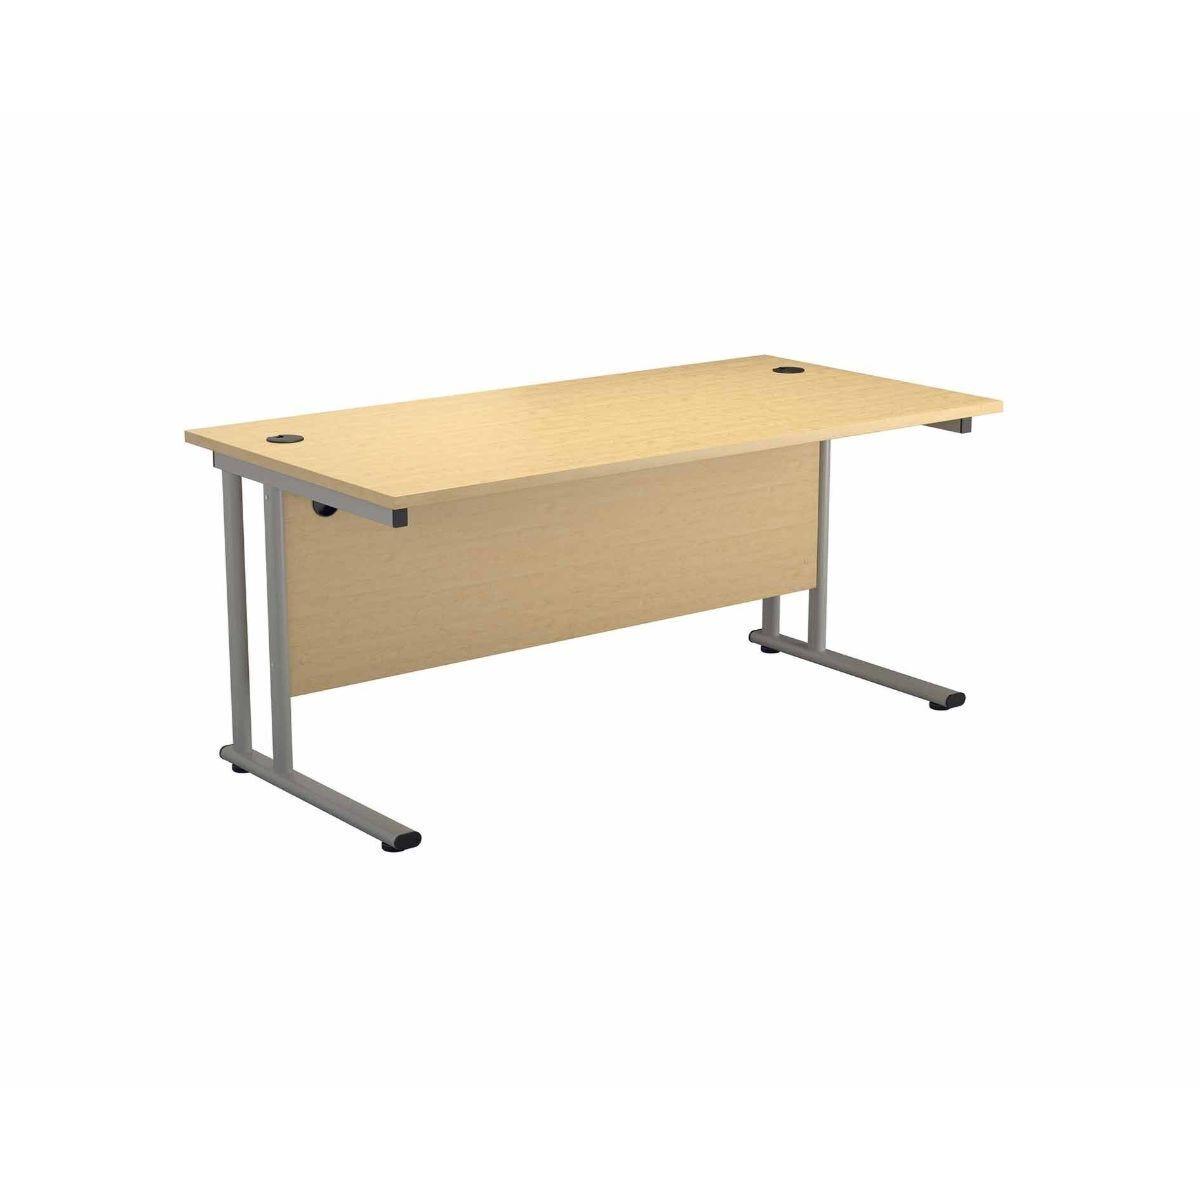 TC Office Start Silver Cantilever Frame Desk 1200x800mm Maple